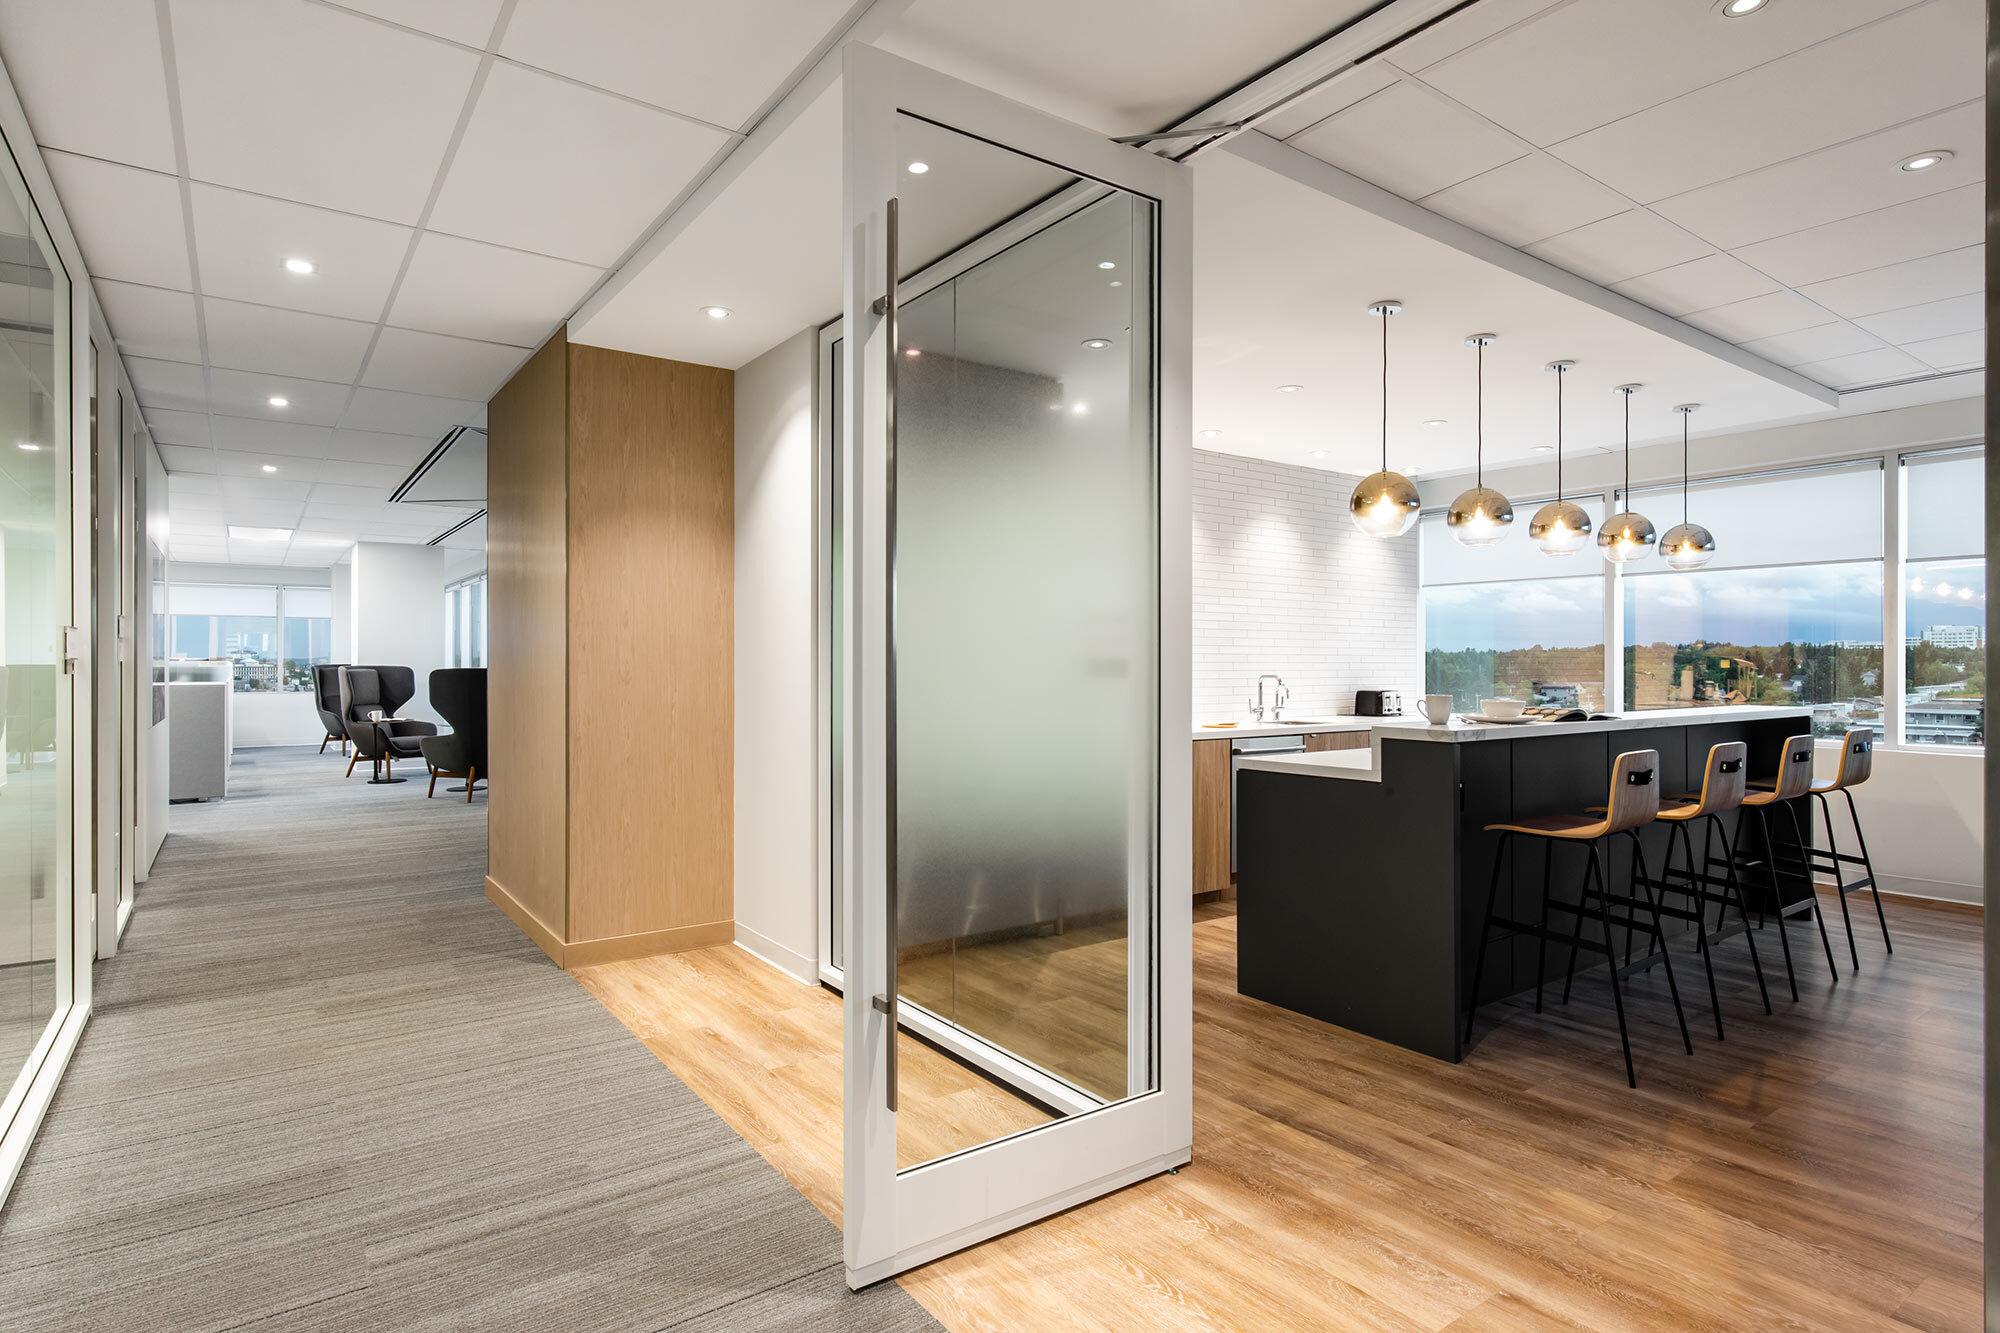 Insurance-interior-design-office-calgary-hallway-kitchen.jpg